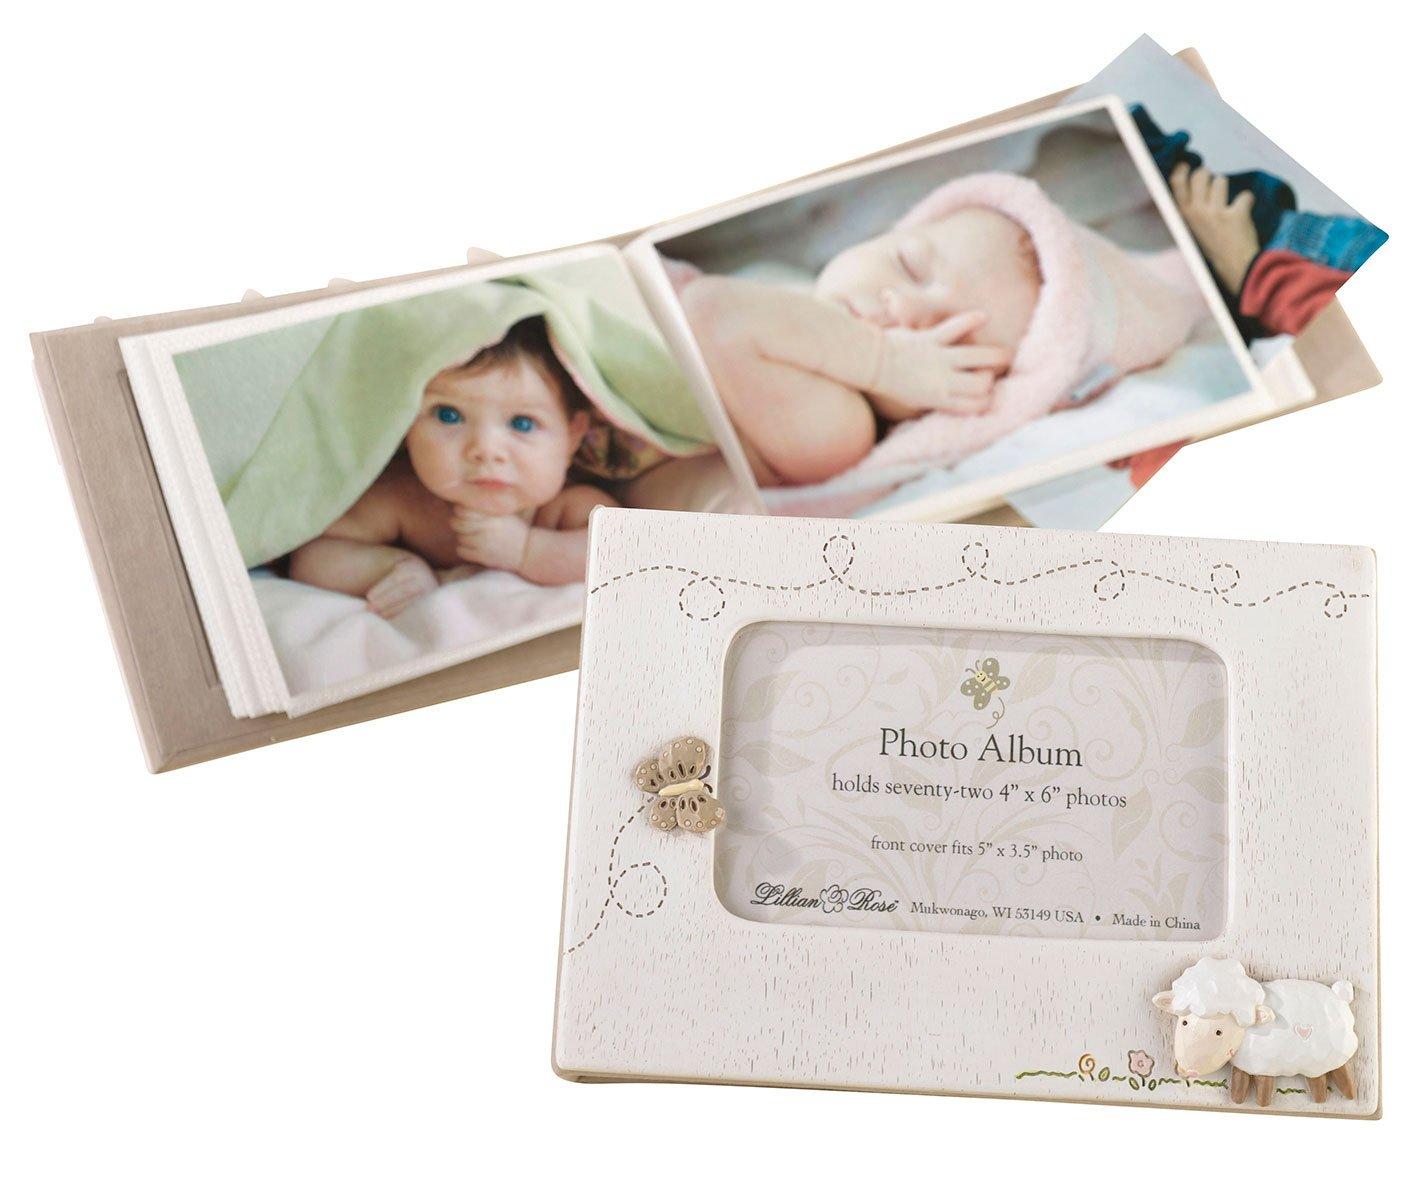 Lillian Rose Photo Album with Photo Frame On Cover, Blue Owl, 4.75 x 7 4.75 x 7 24PH210 OB